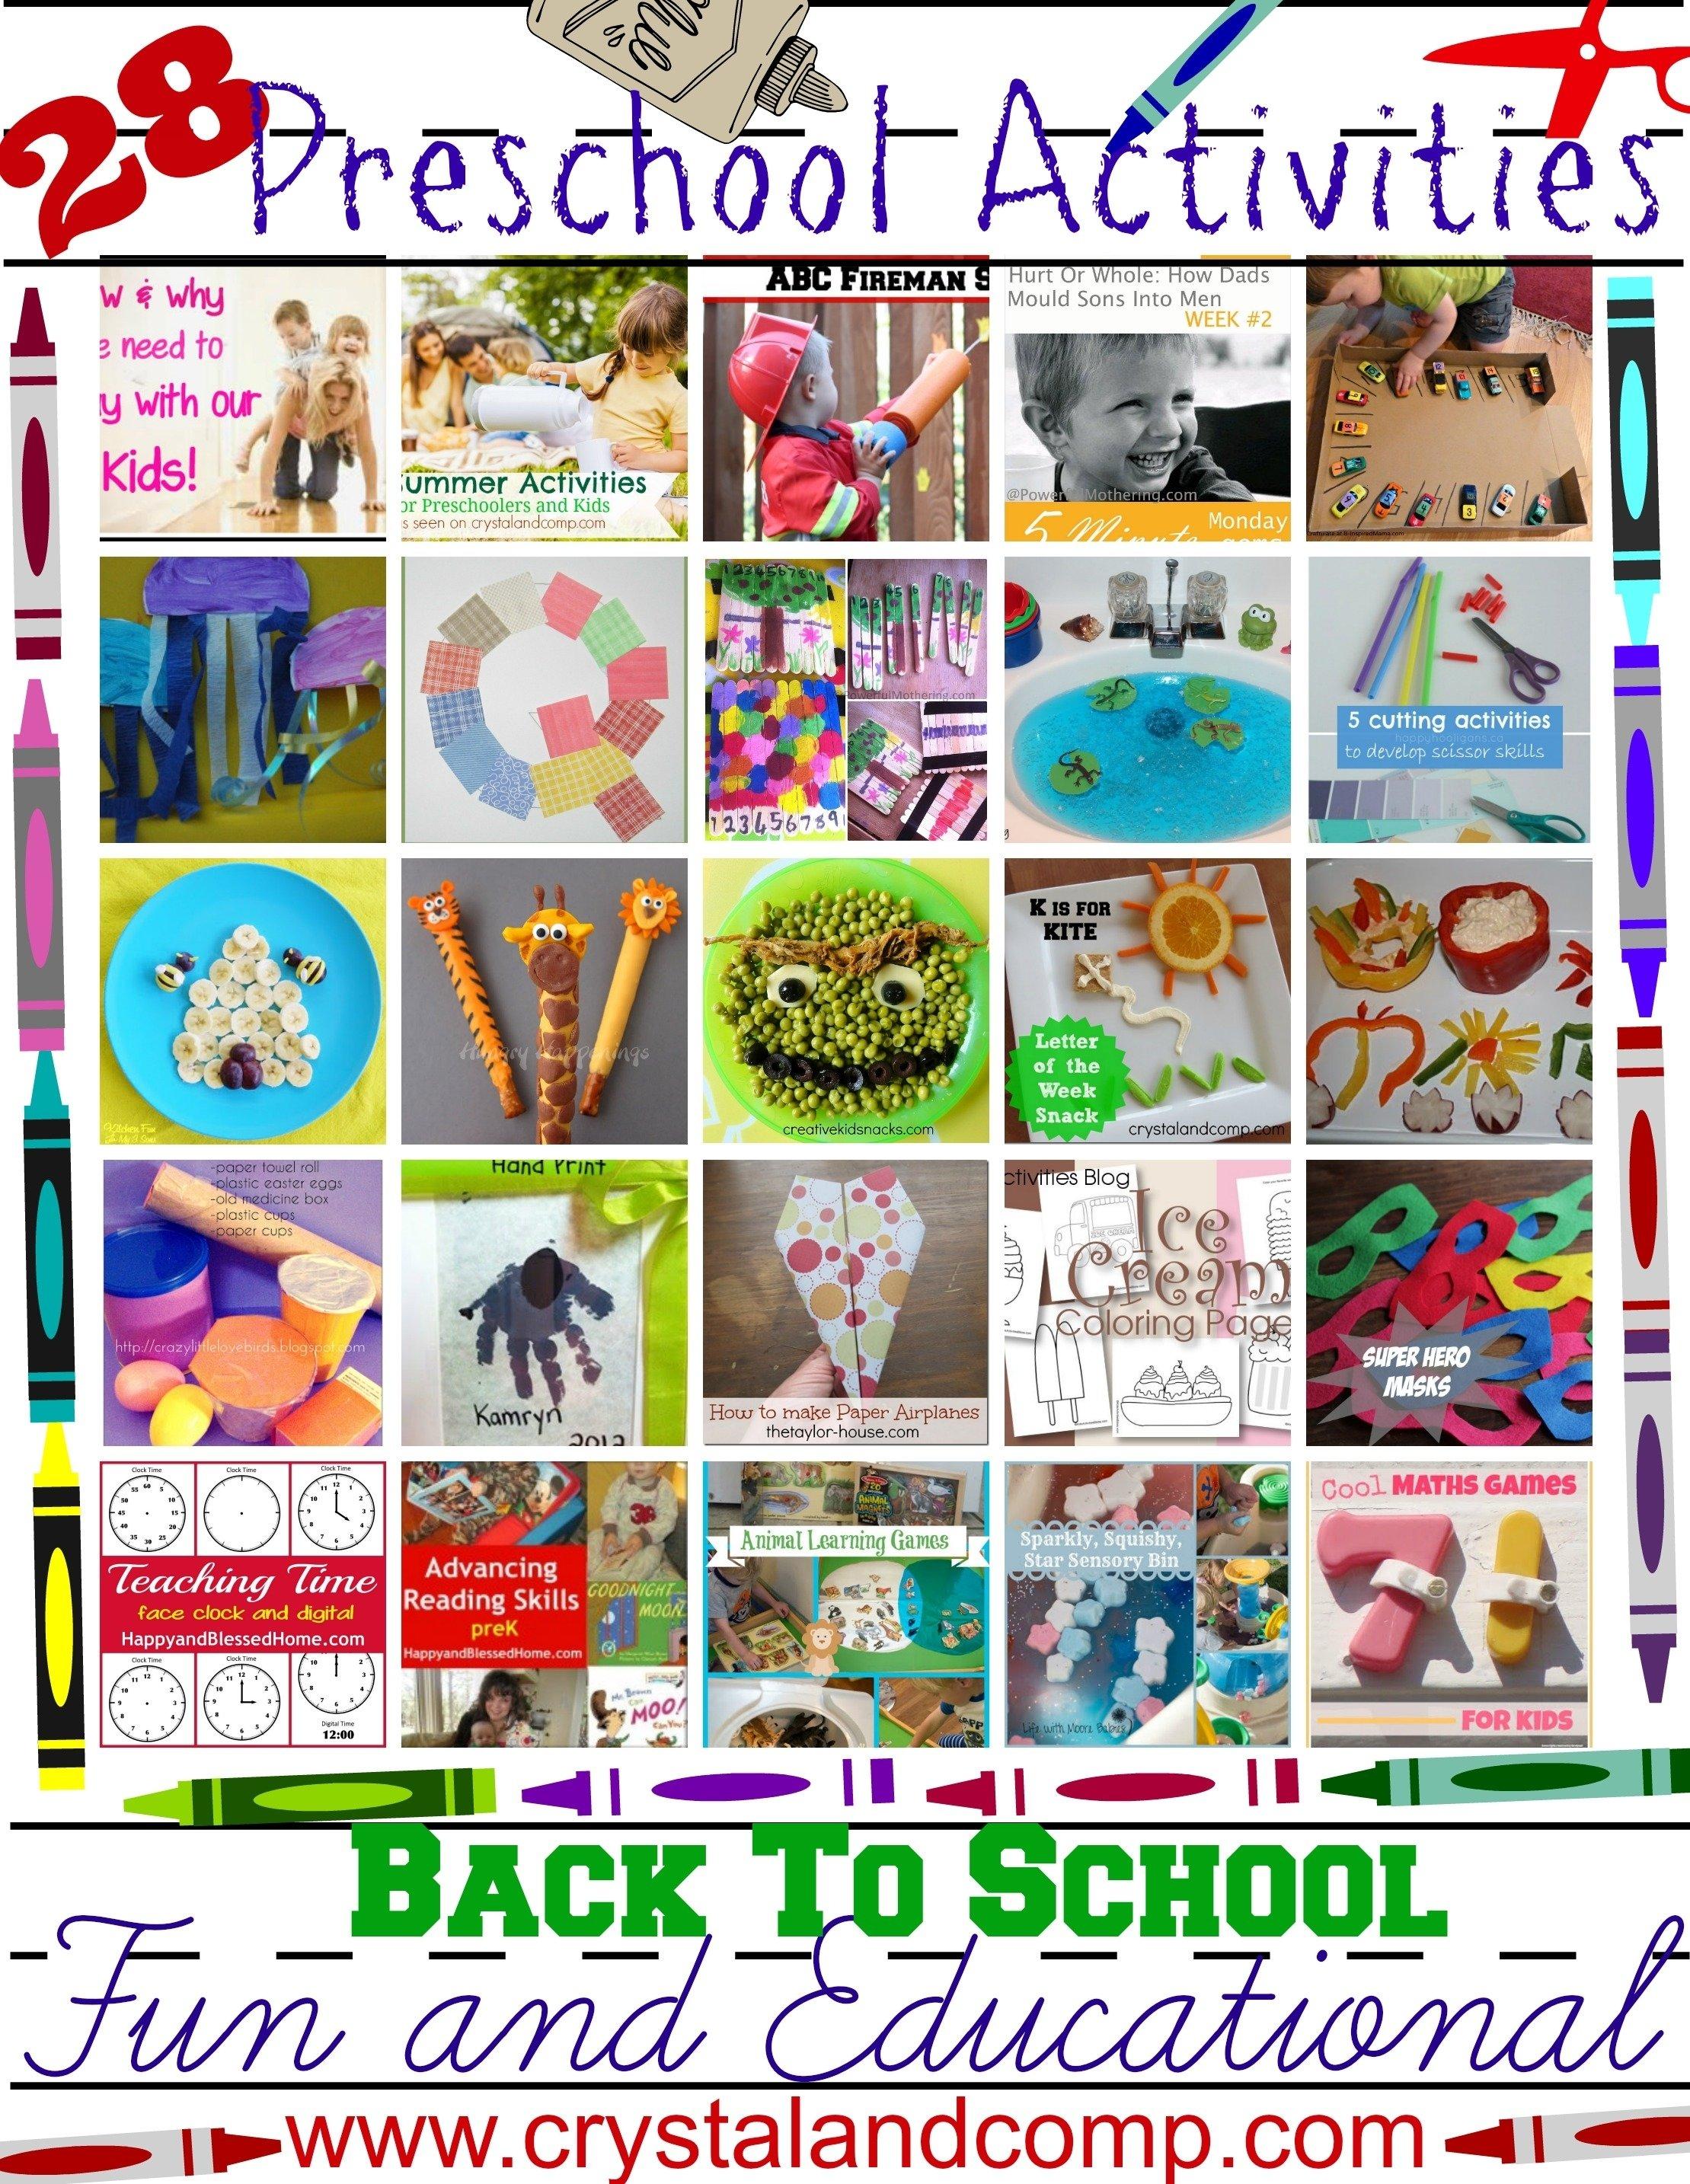 10 Attractive Preschool Back To School Ideas 28 fun and educational preschool activities for back to school 2020